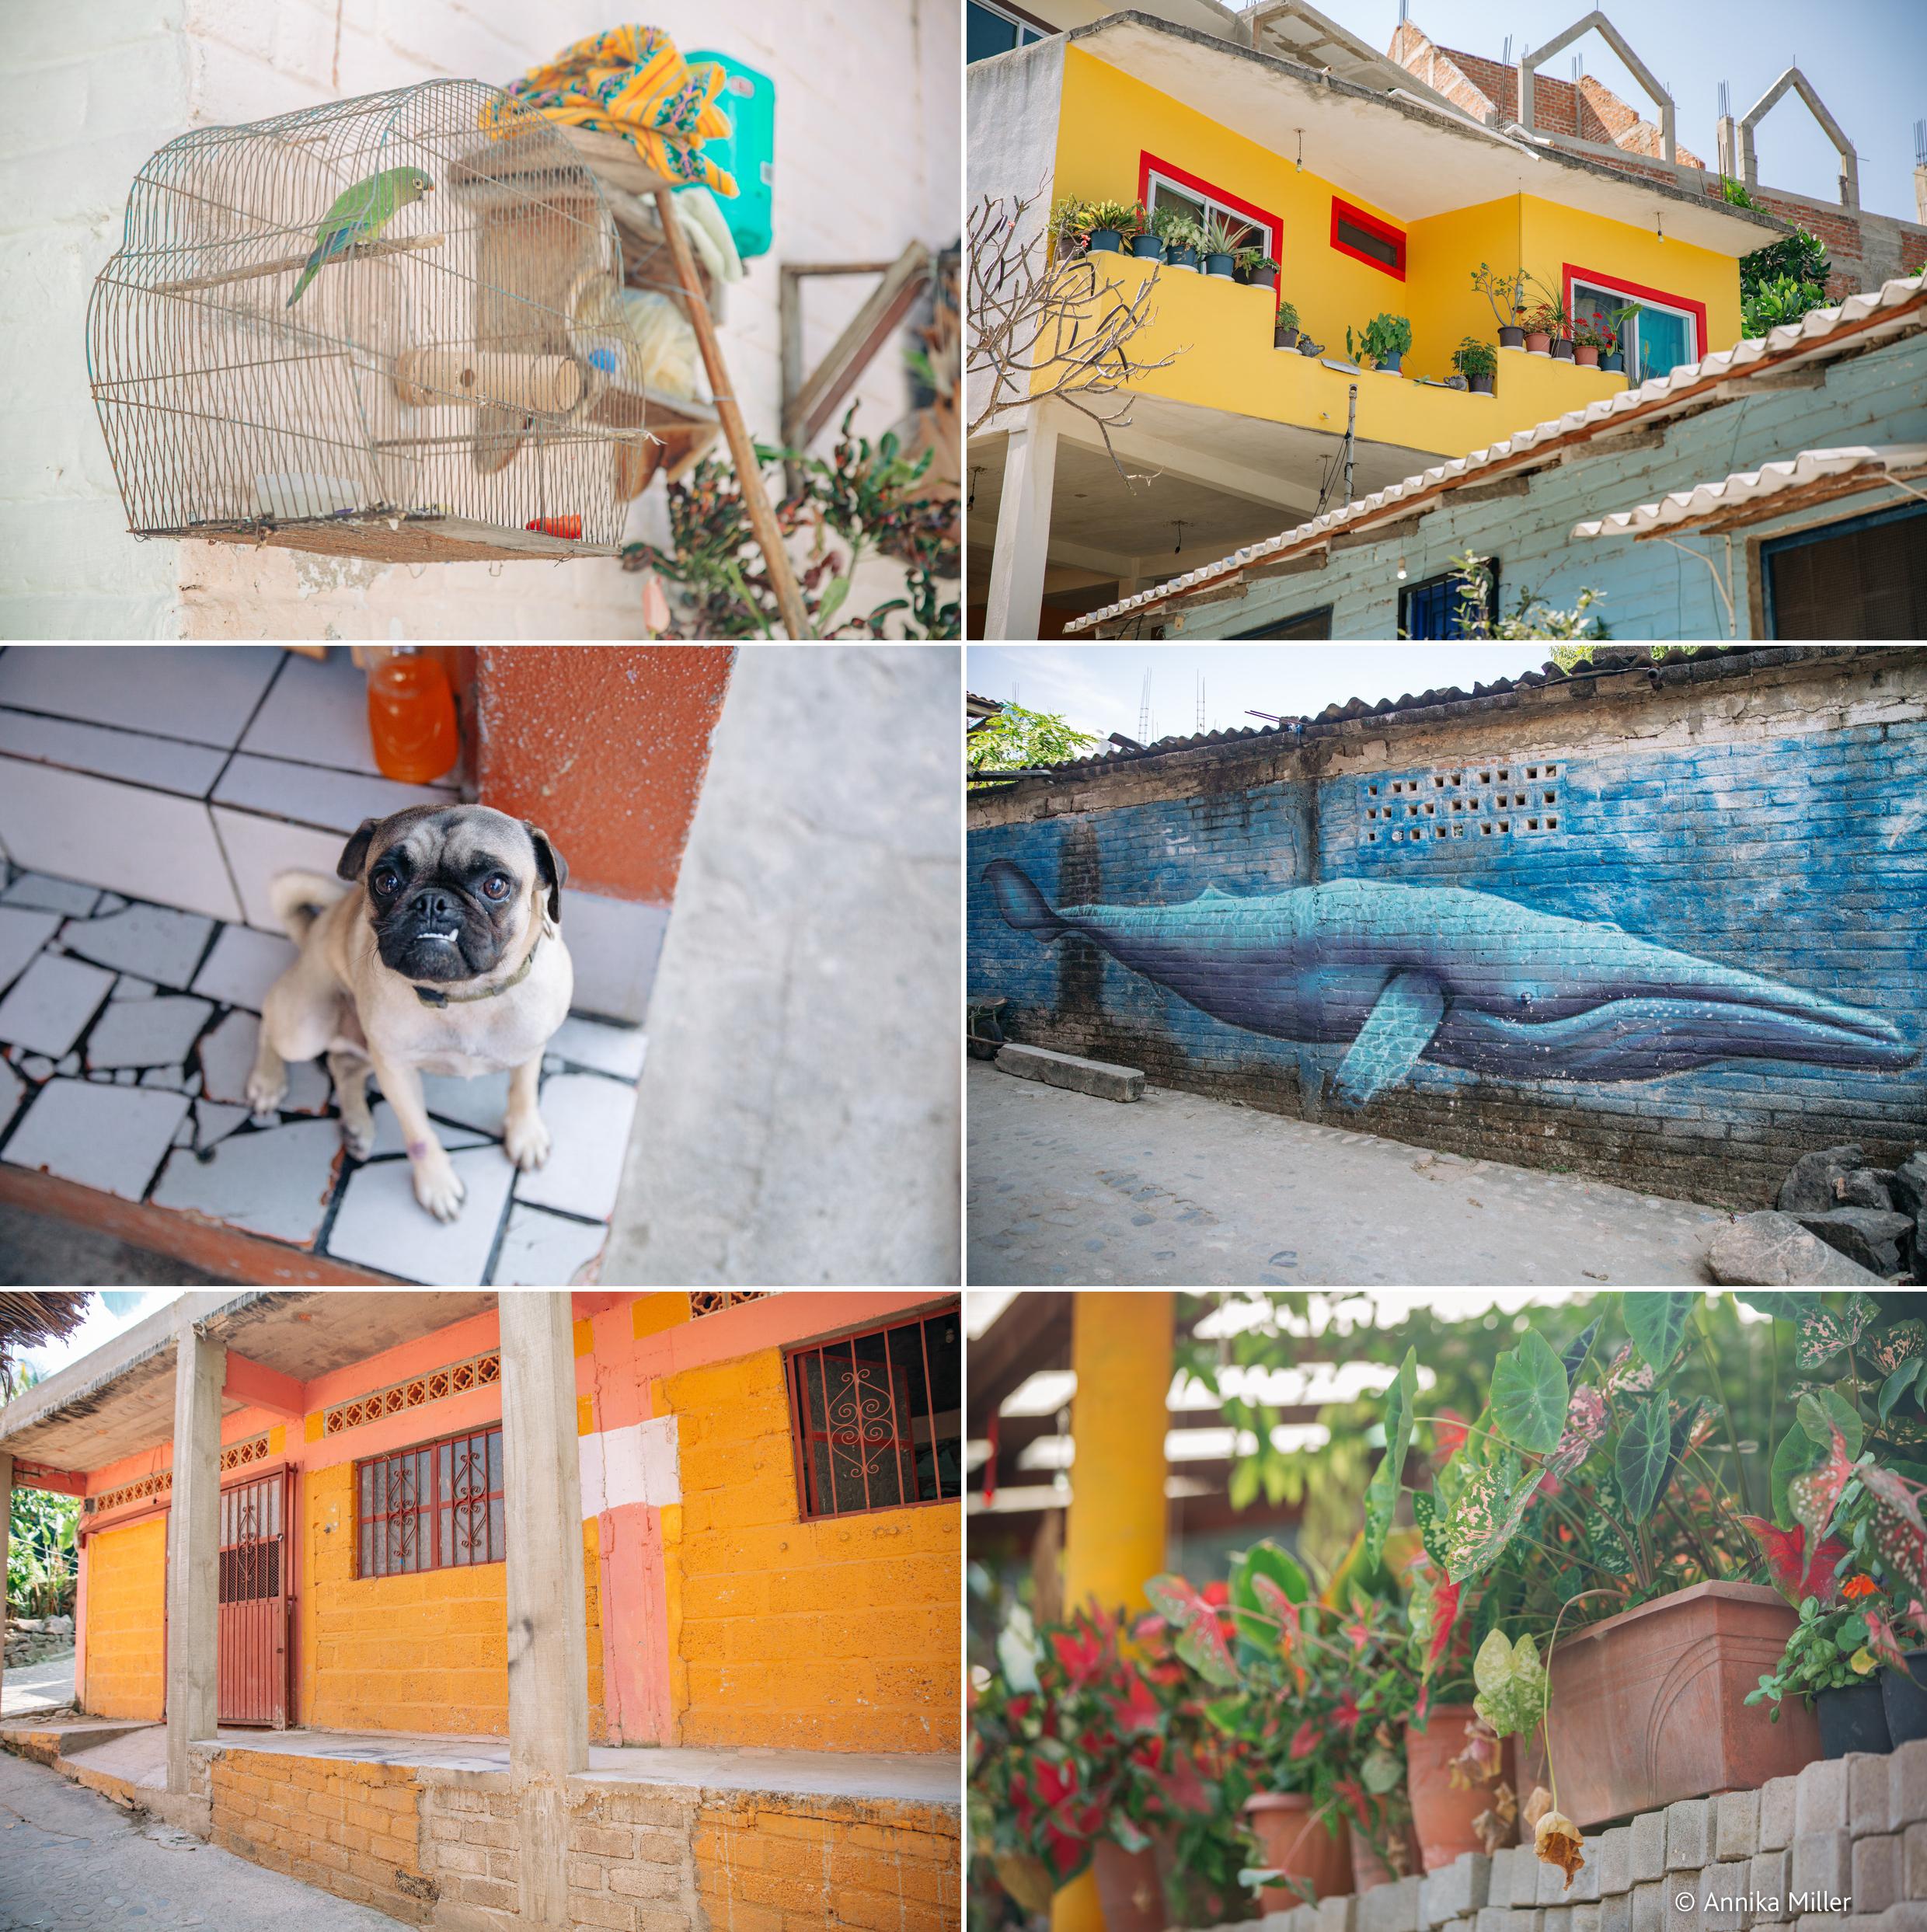 YelapaMexico19-5.jpg